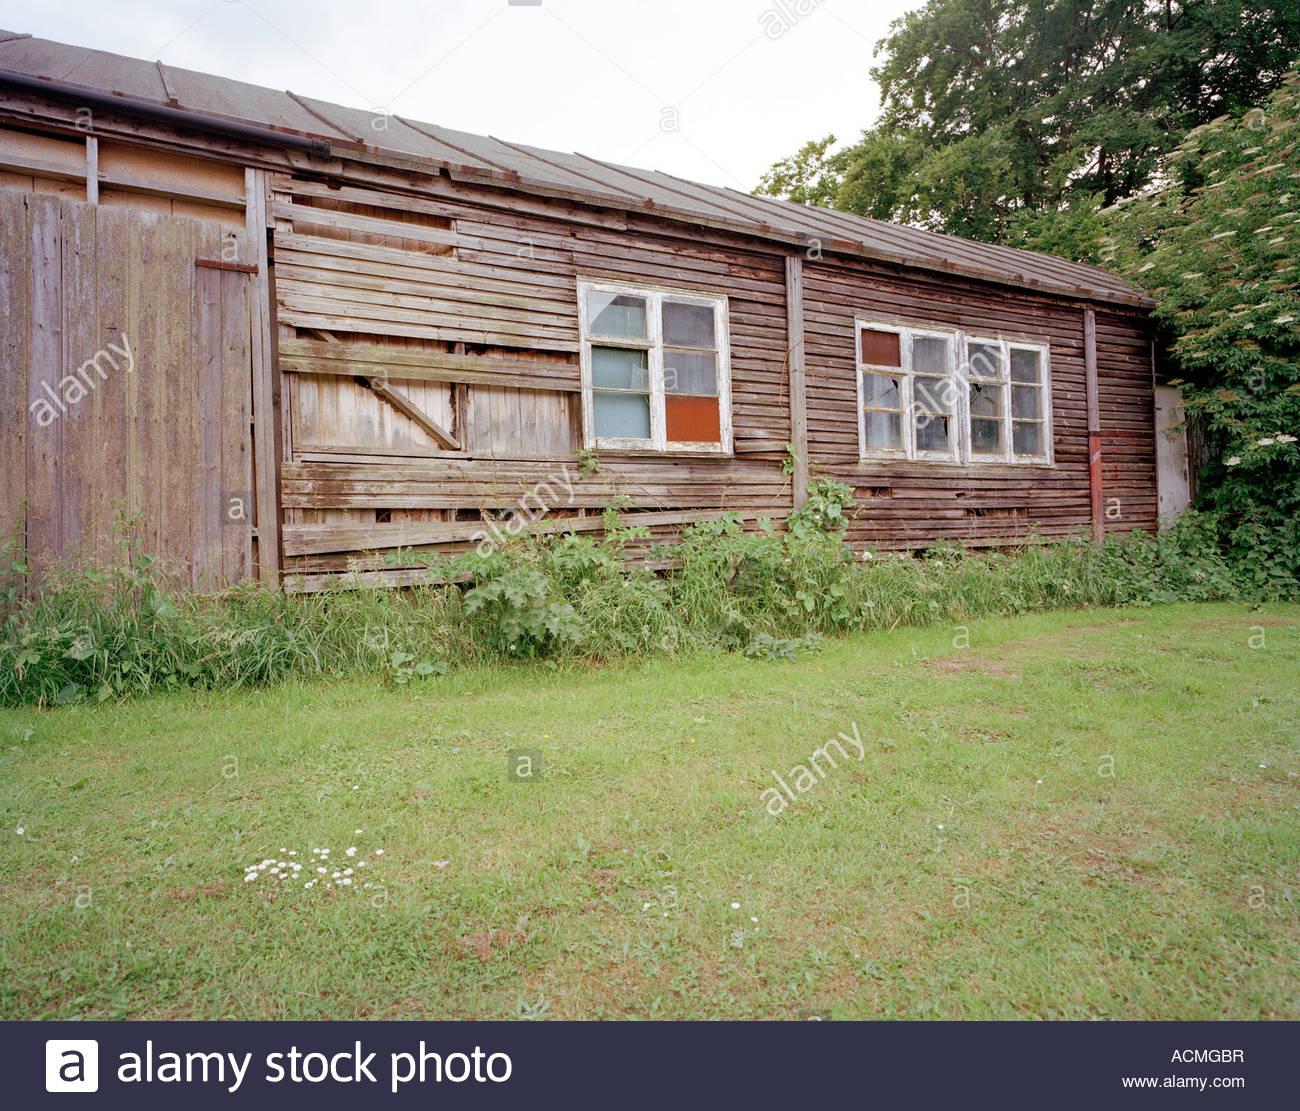 World war two dispersal hut for fighter pilots, RAF Biggin Hill, Kent, England, UK. - Stock Image